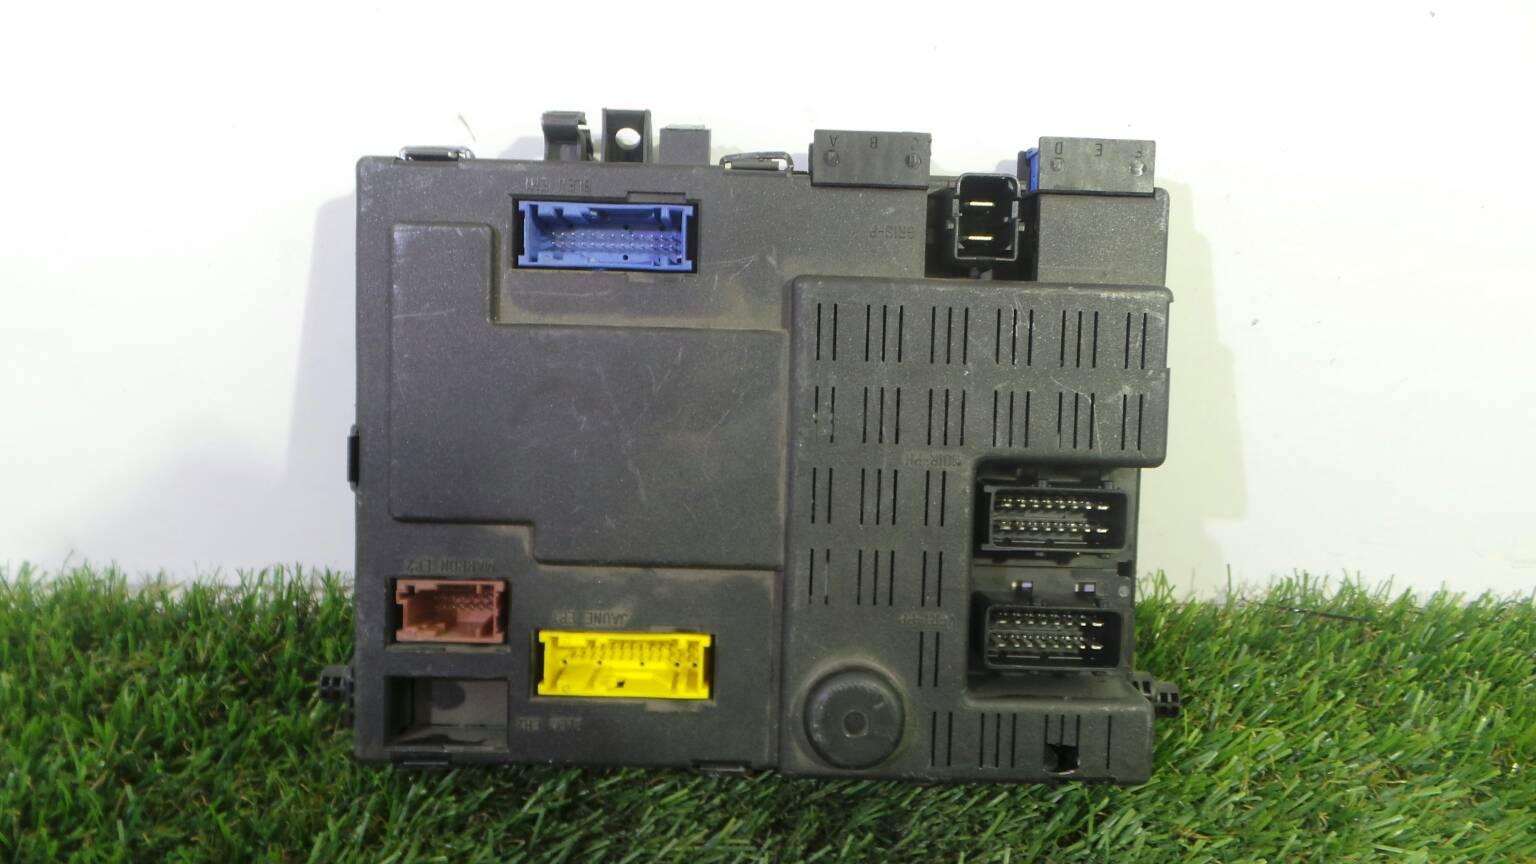 hight resolution of fuse box 96 424 094 80 citro n xsara picasso n68 2 0 hdi